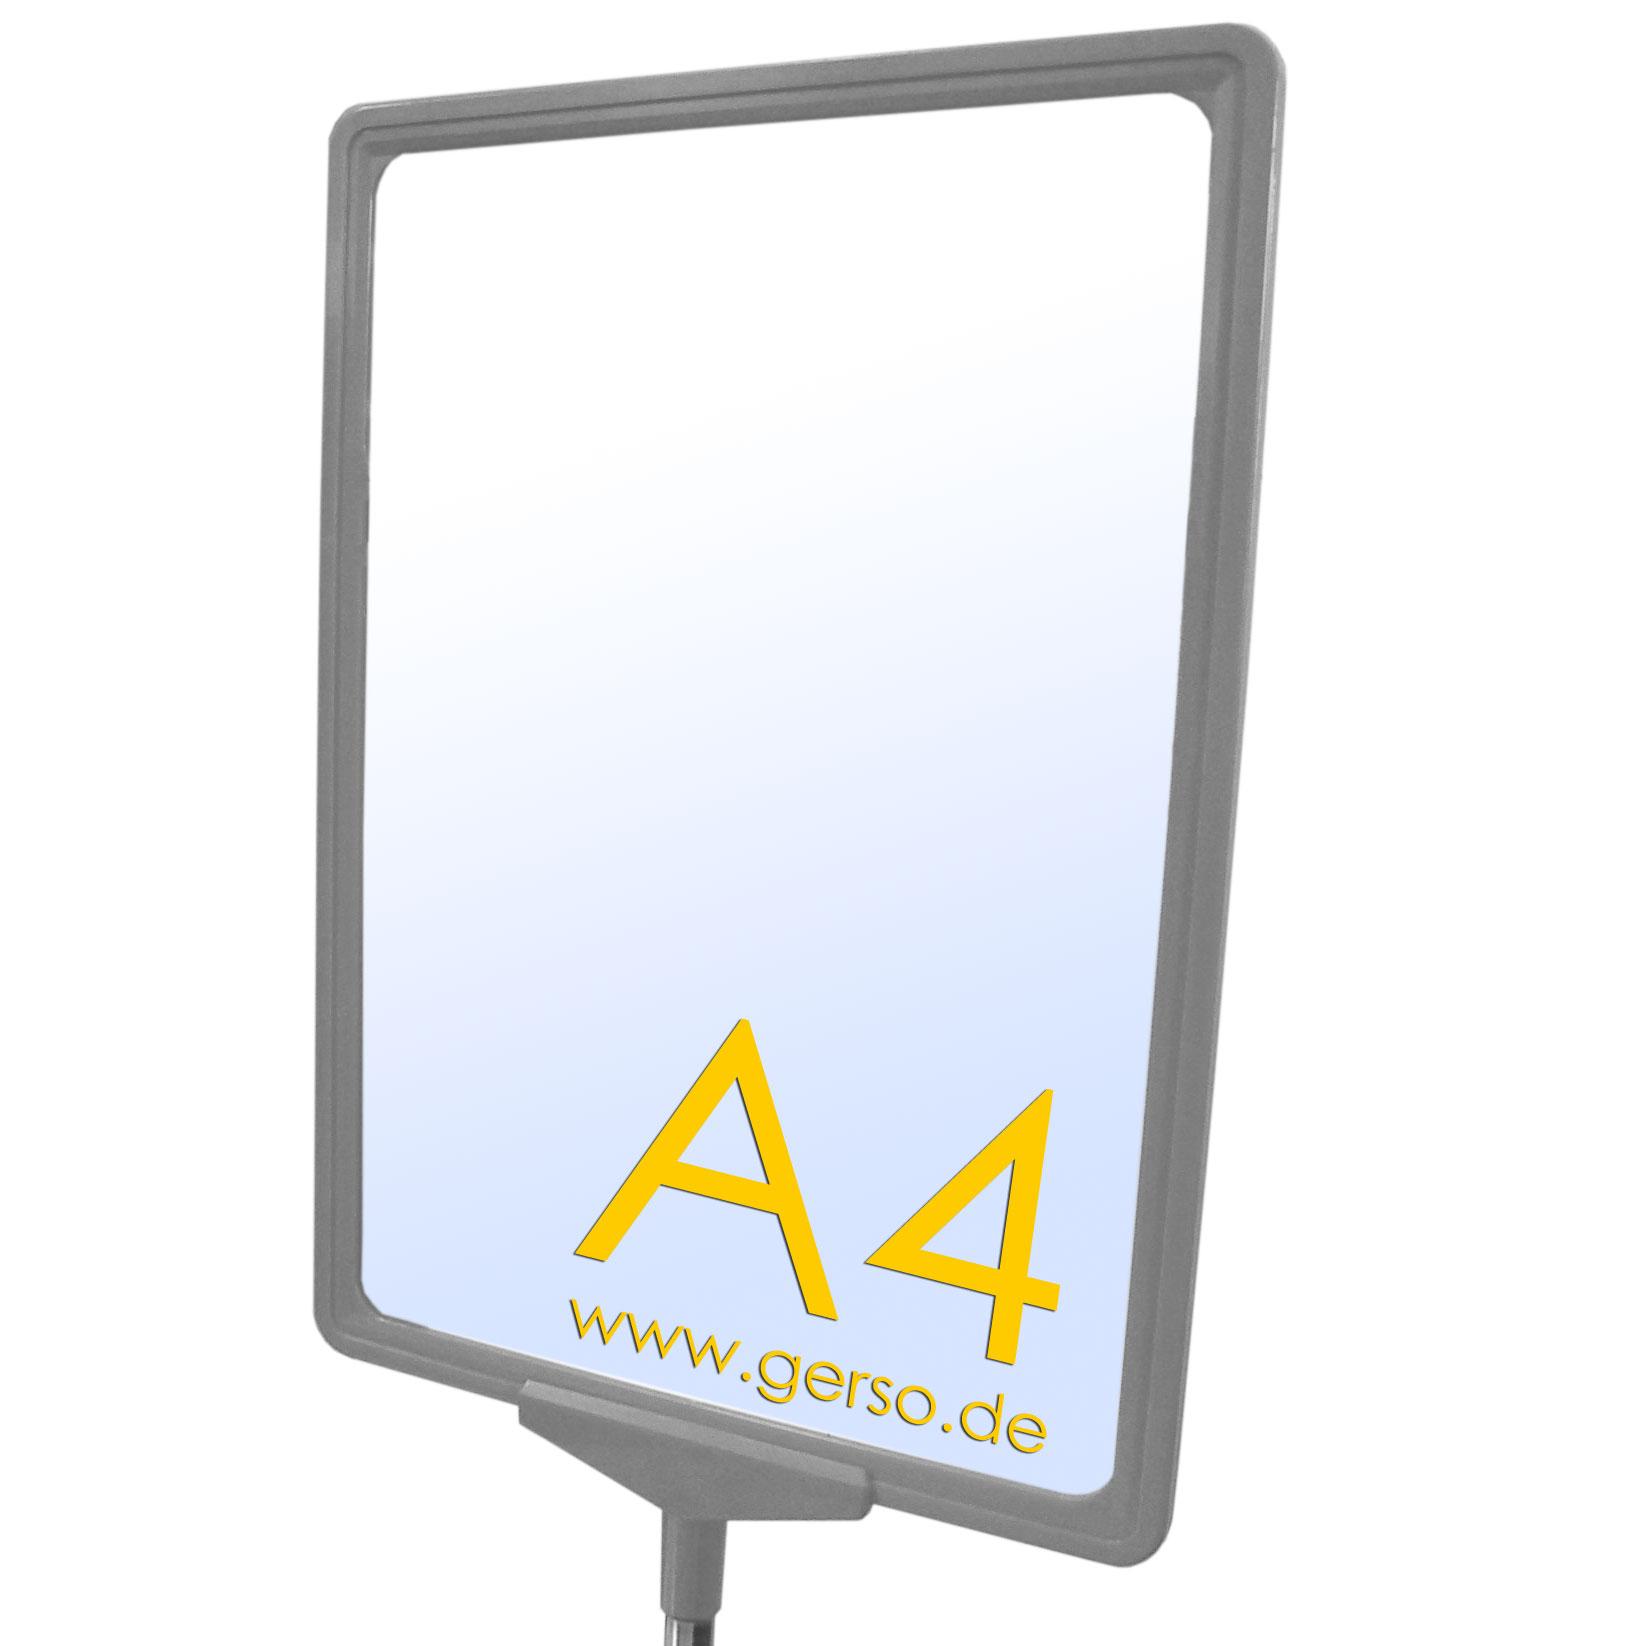 Plakatrahmen A4 in grau